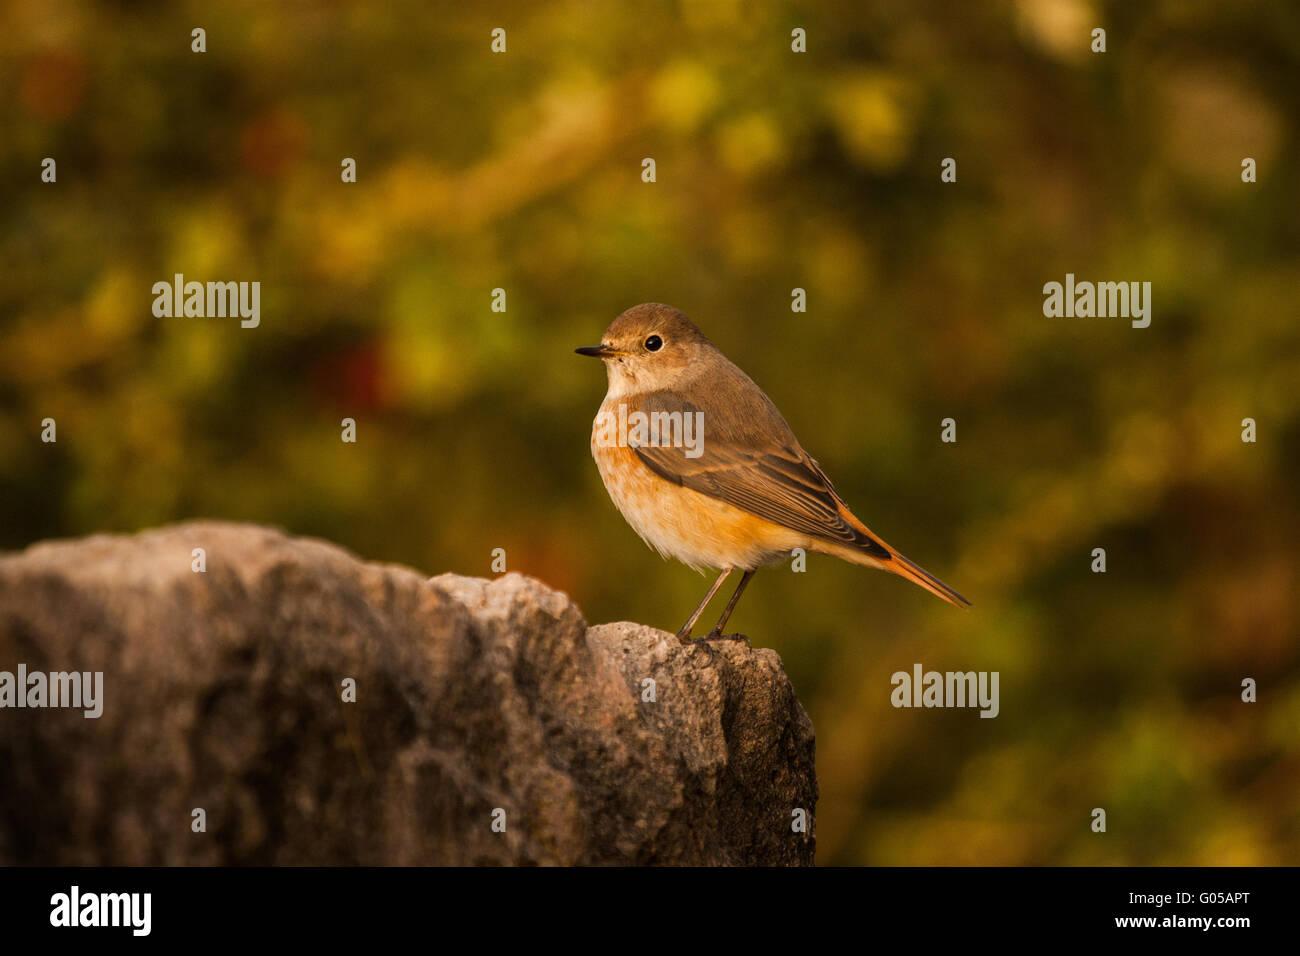 Common redstart (Phoenicurus phoenicurus) - Stock Image